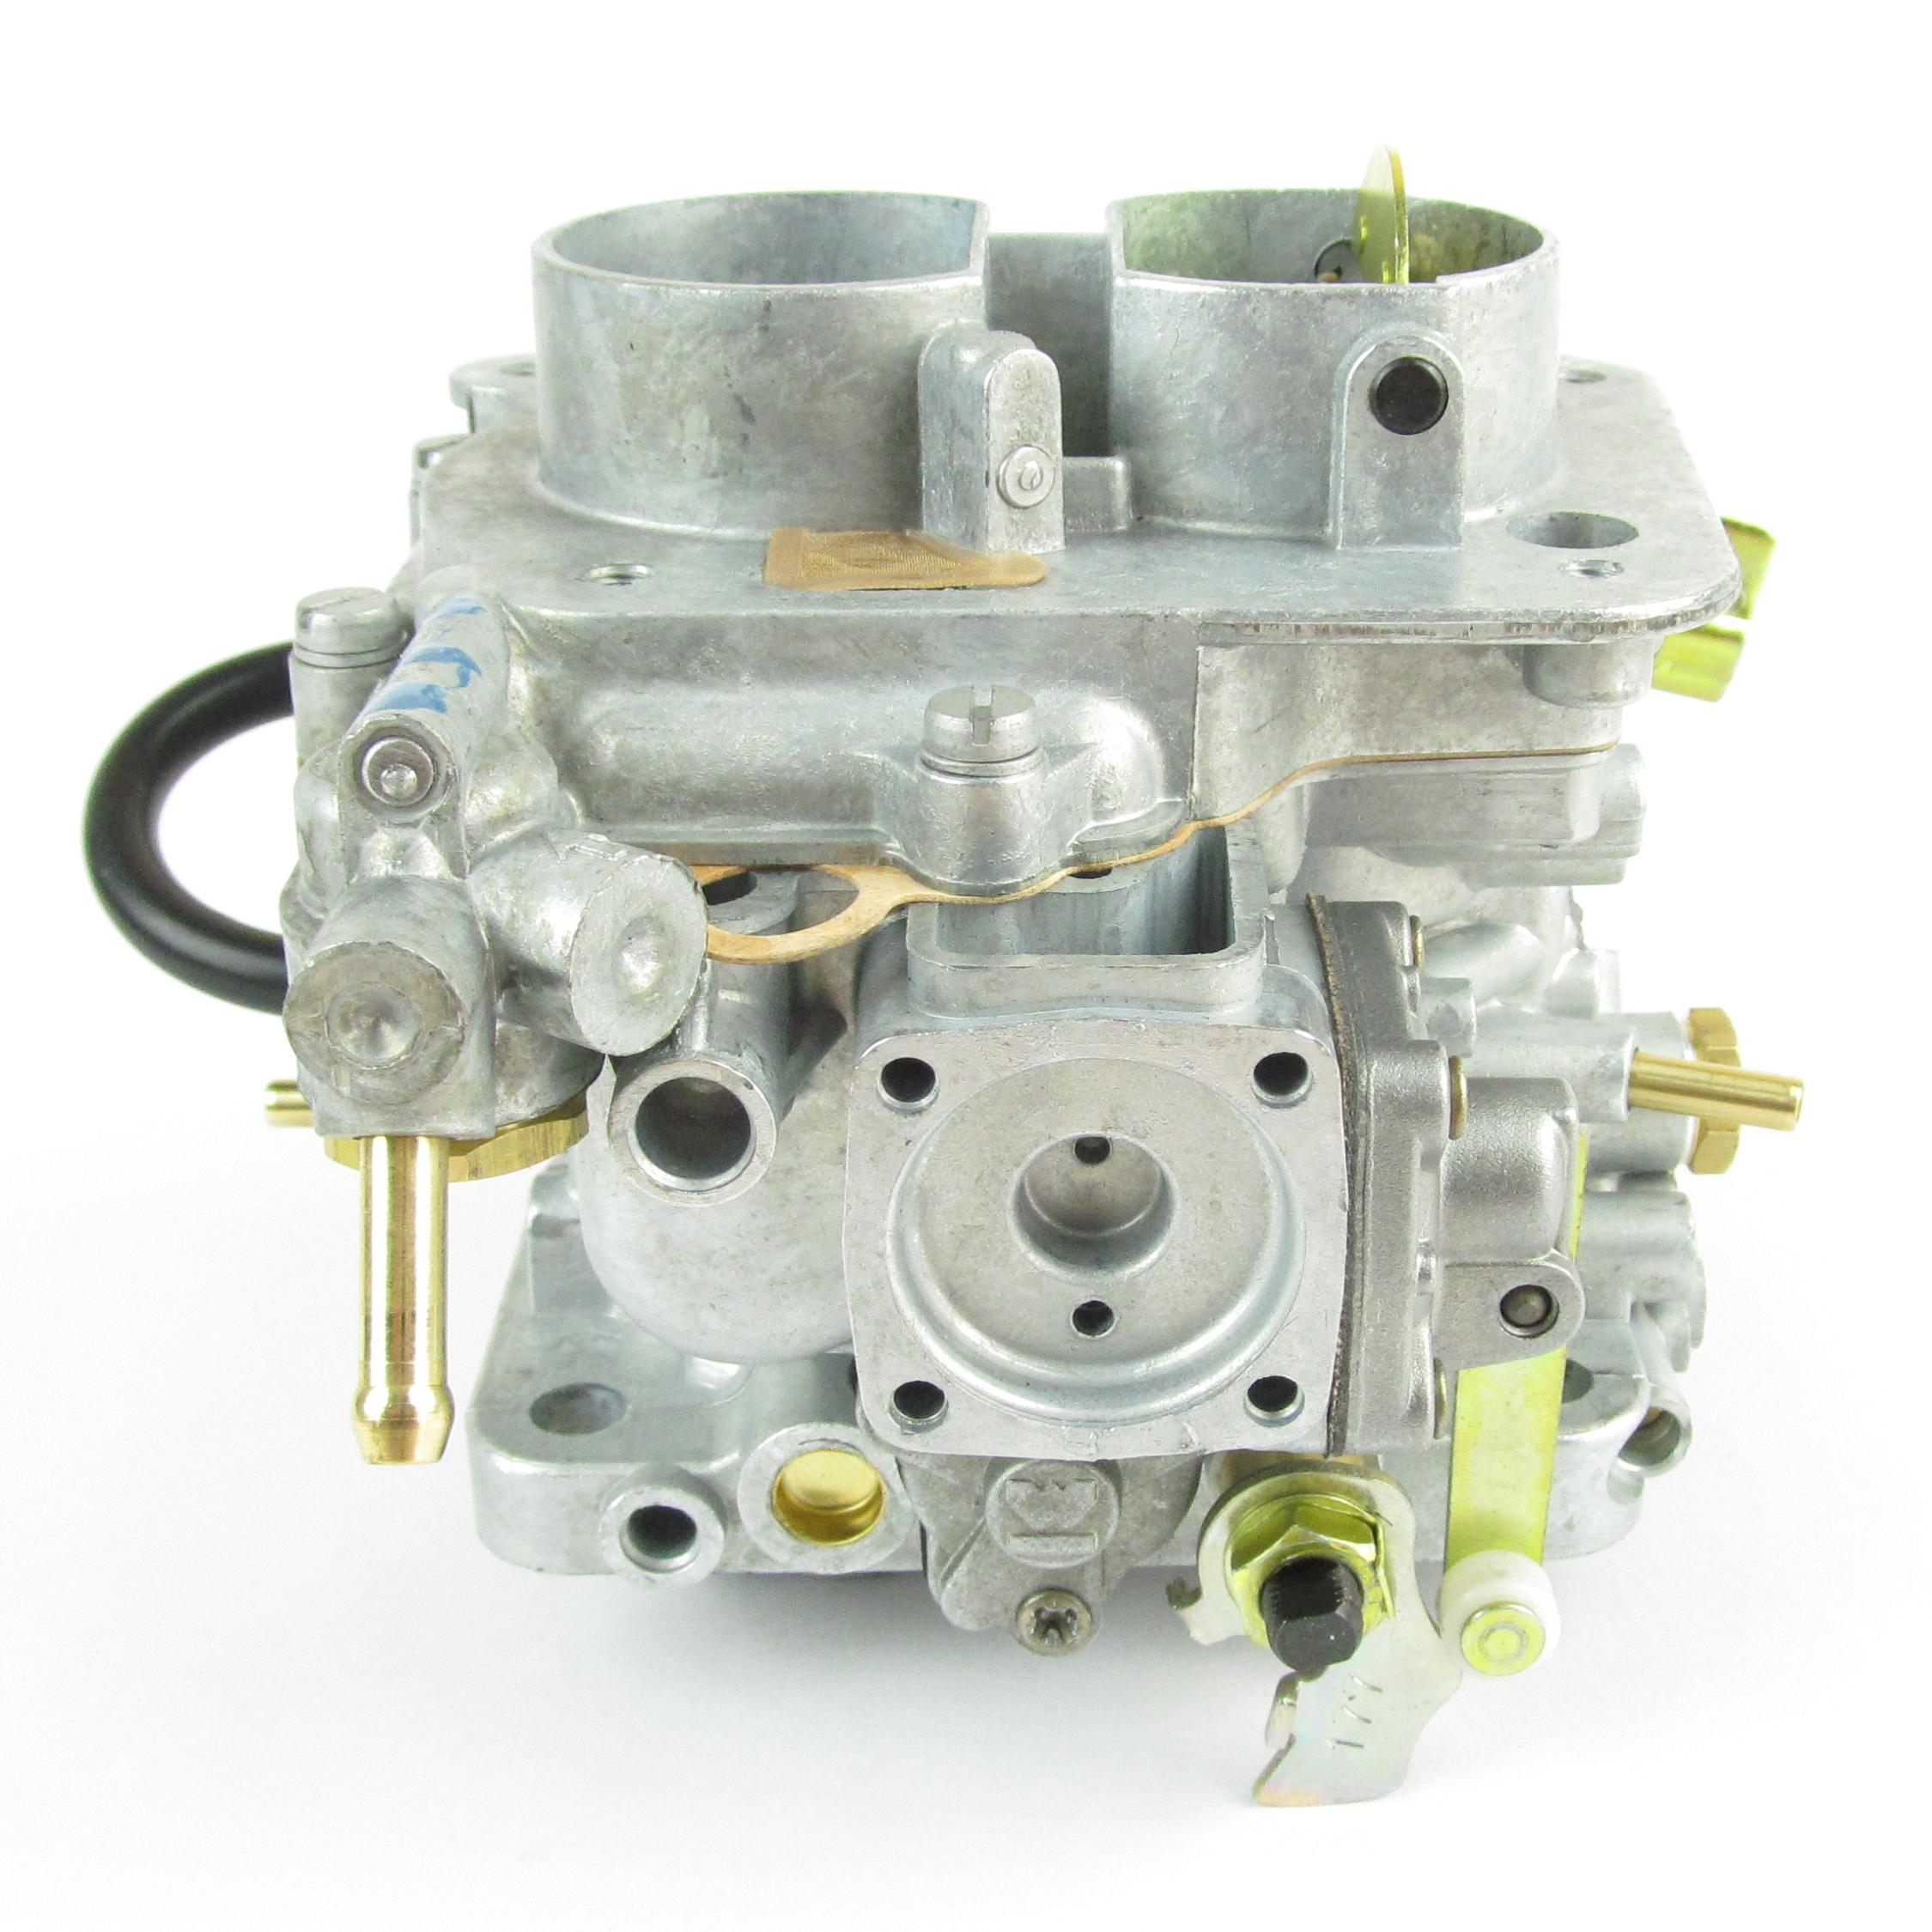 weber 32 34 dmtl manual choke carburettor classic ford bmw vw golf rh classiccarbs co uk